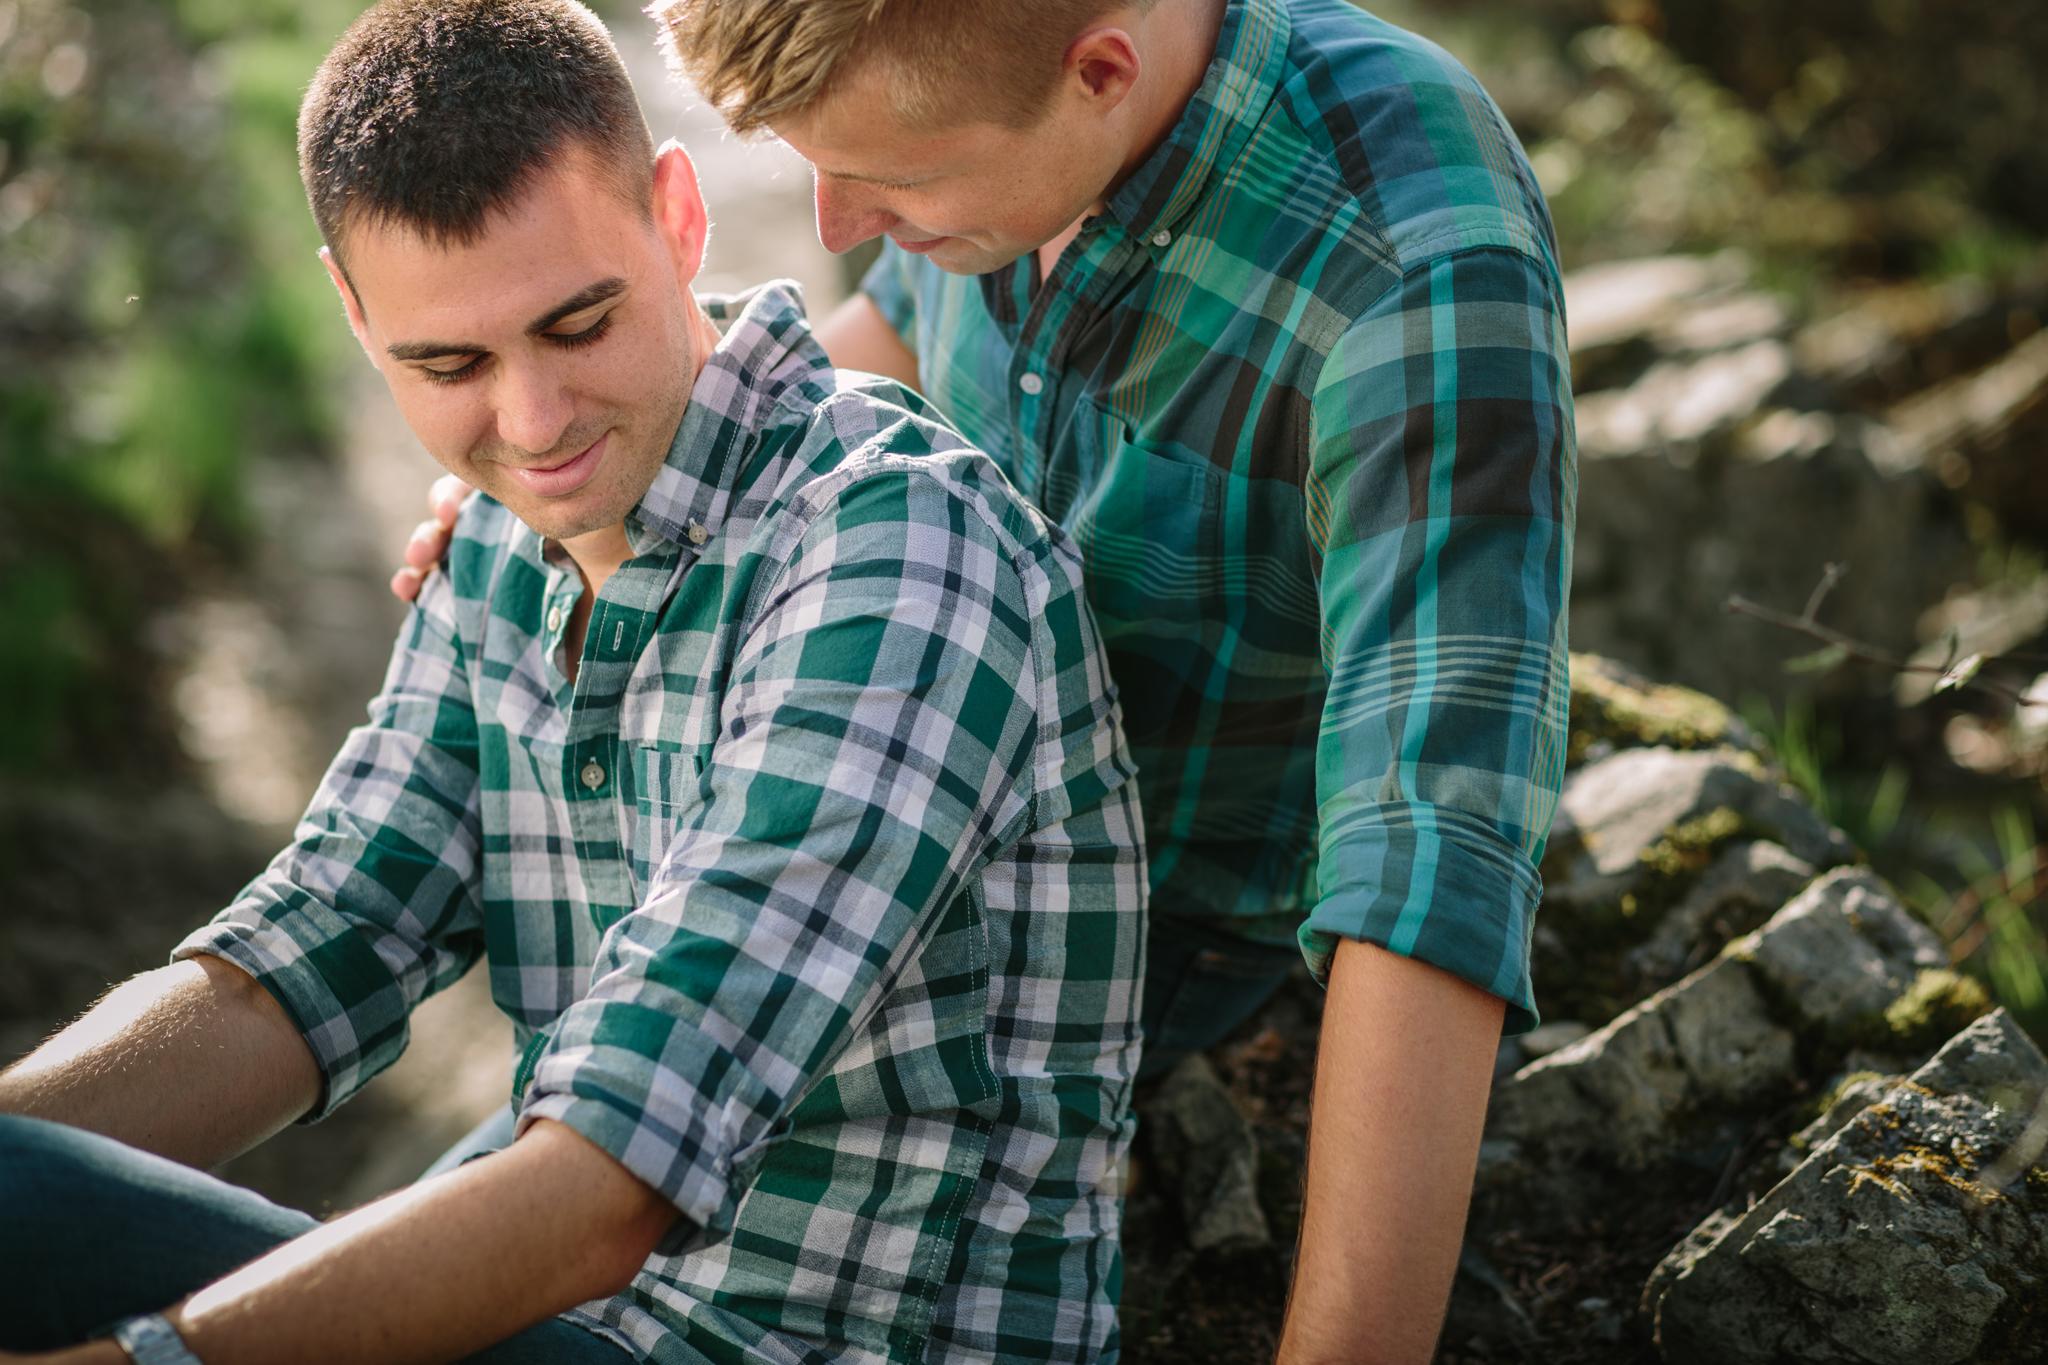 170426_0269_Brian-Nick-Engagement_022.jpg